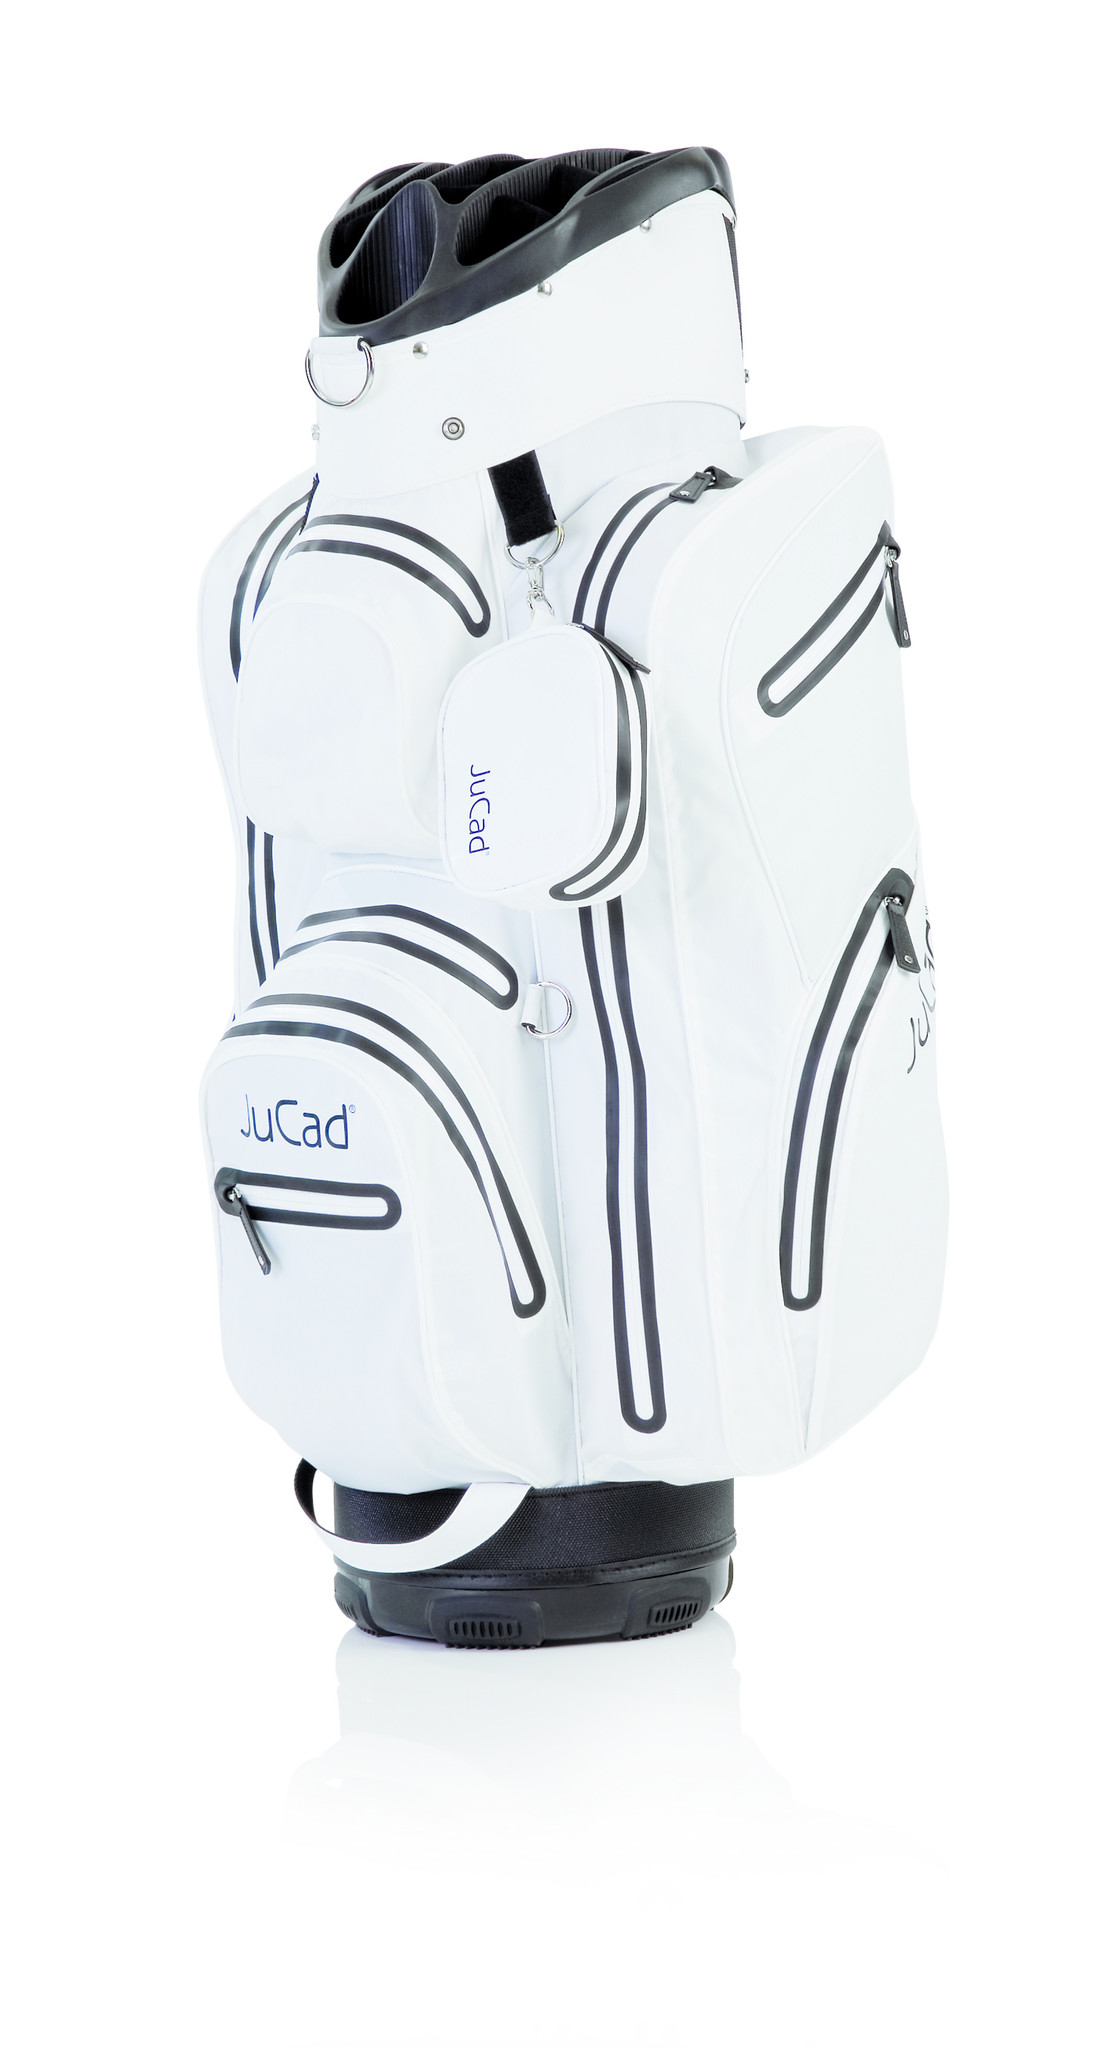 JuCad Aquastop (white)